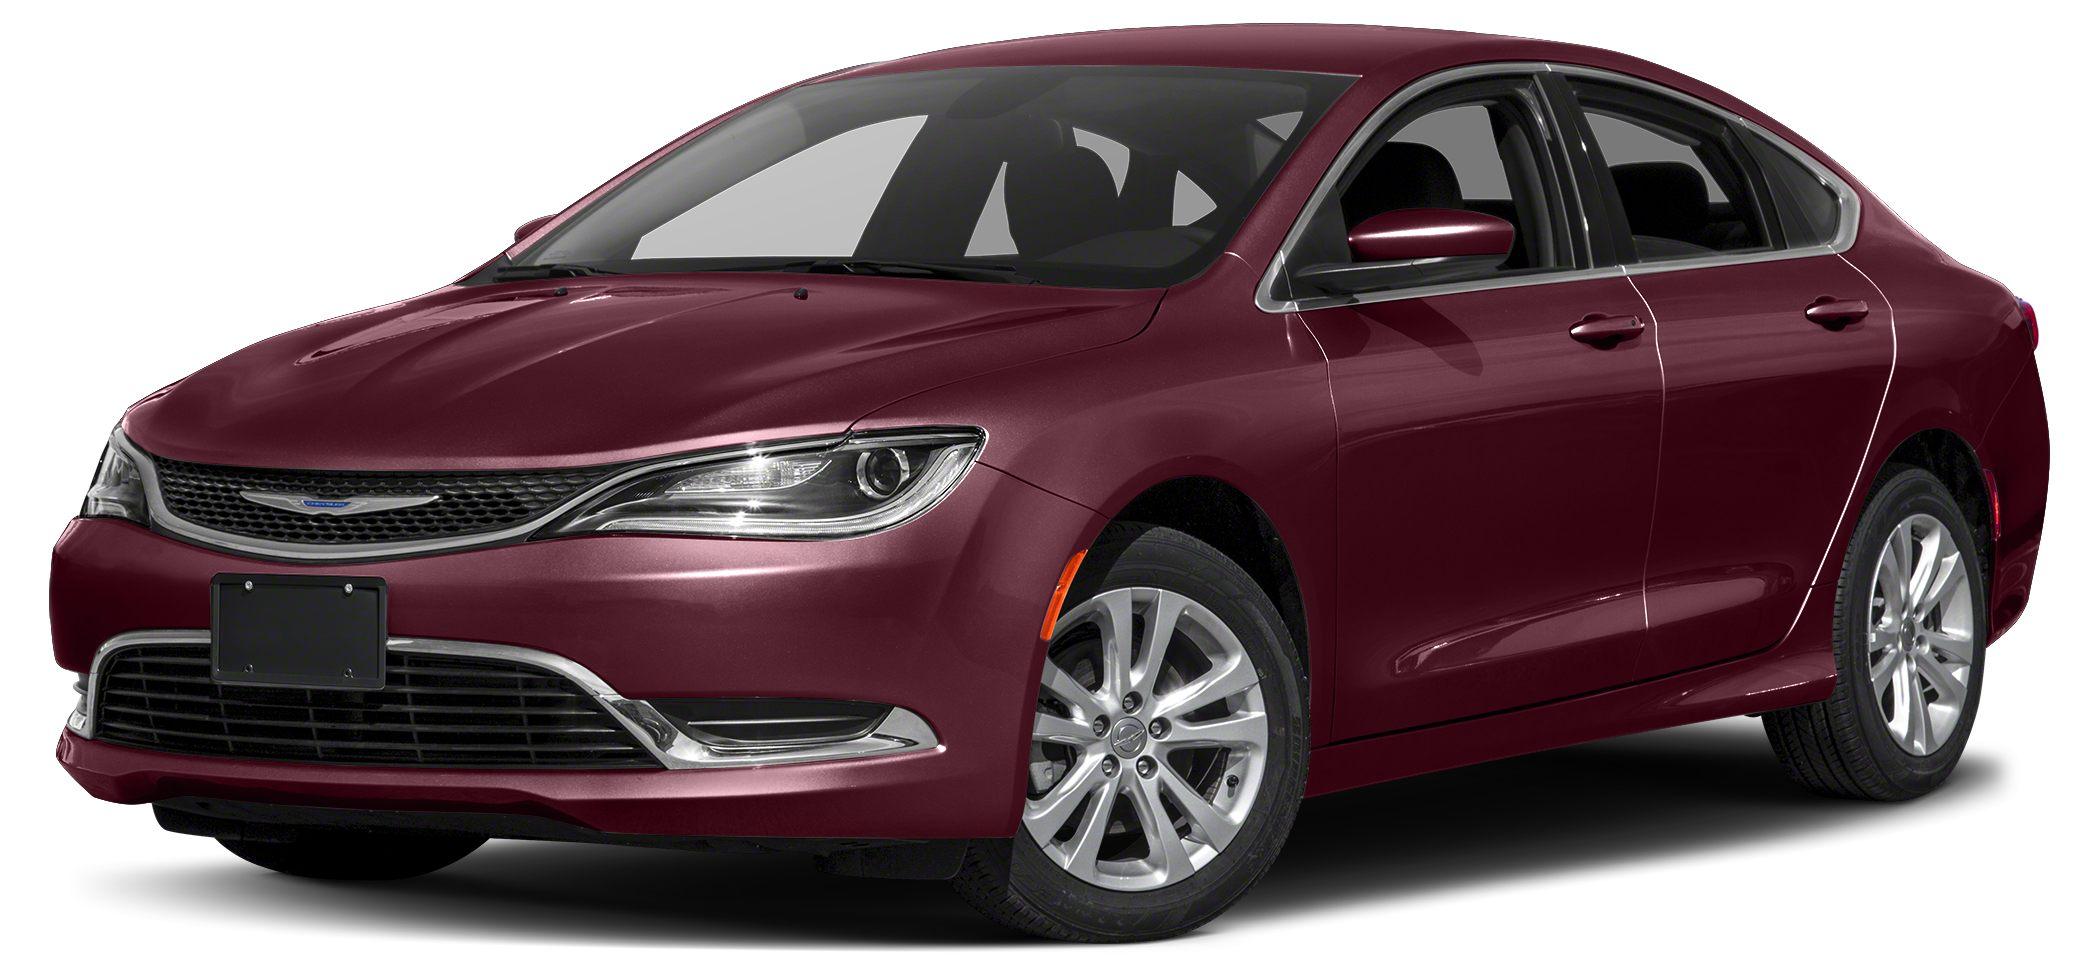 2015 Chrysler 200 Limited Miles 13654Color Velvet Red Pearlcoat Stock K15706A VIN 1C3CCCAB7F